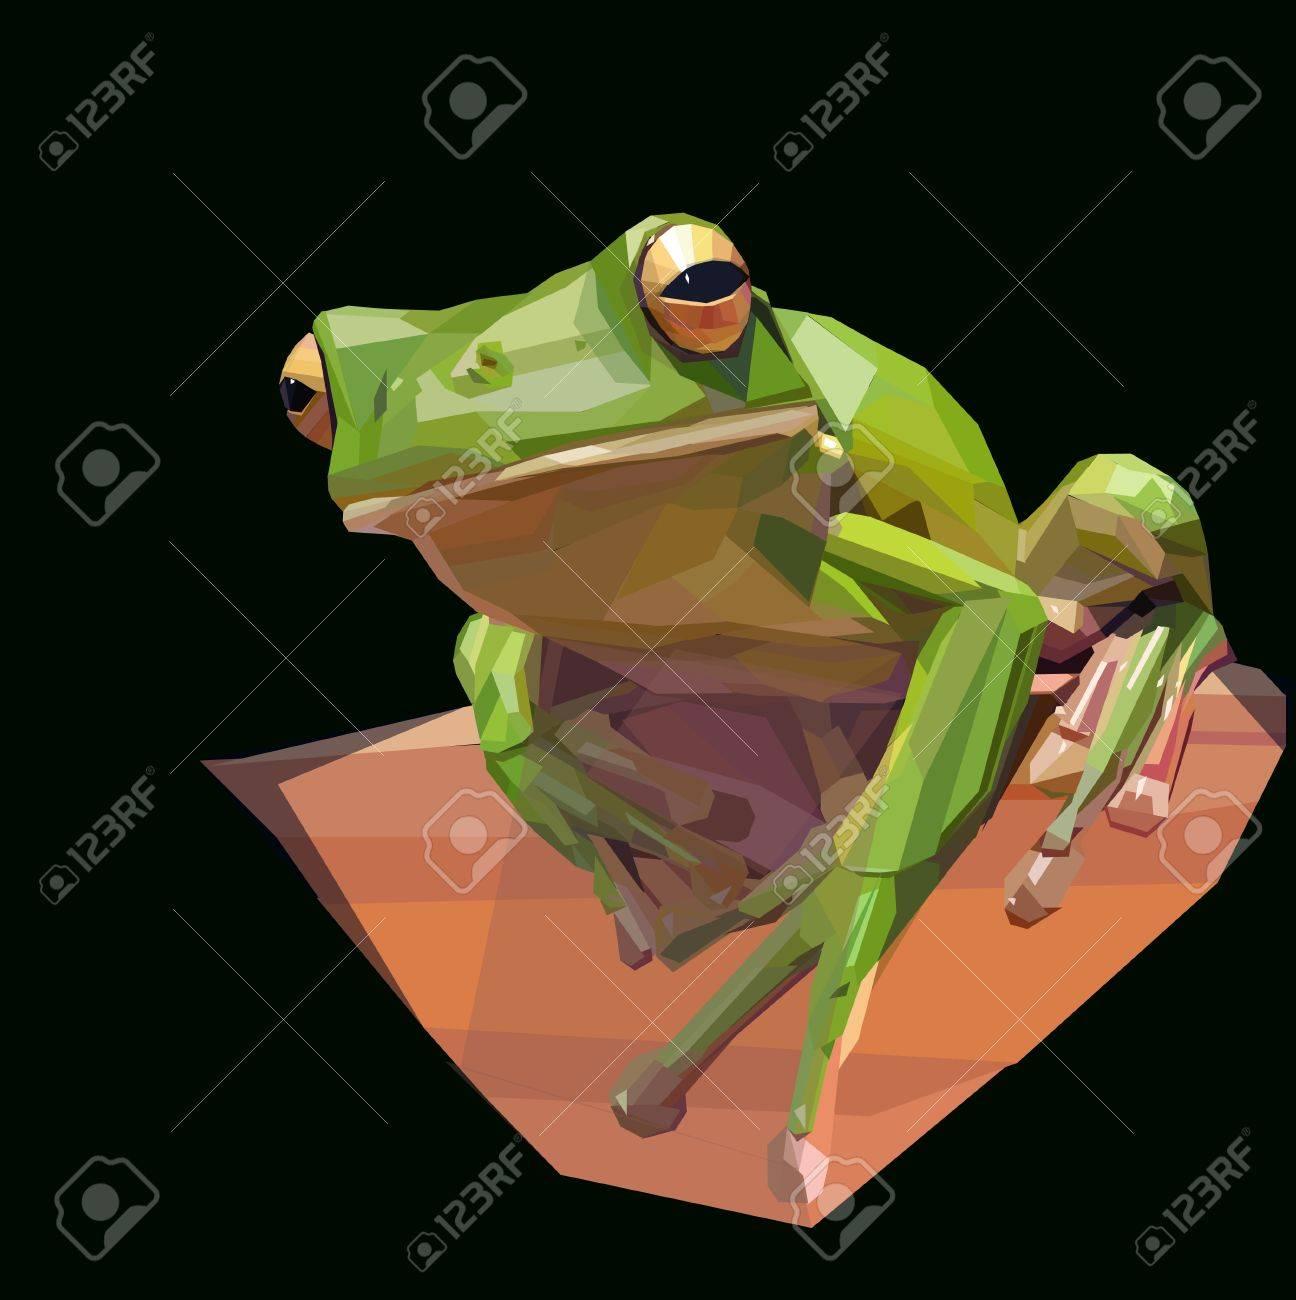 green tree frog sitting on dark background - 48676328